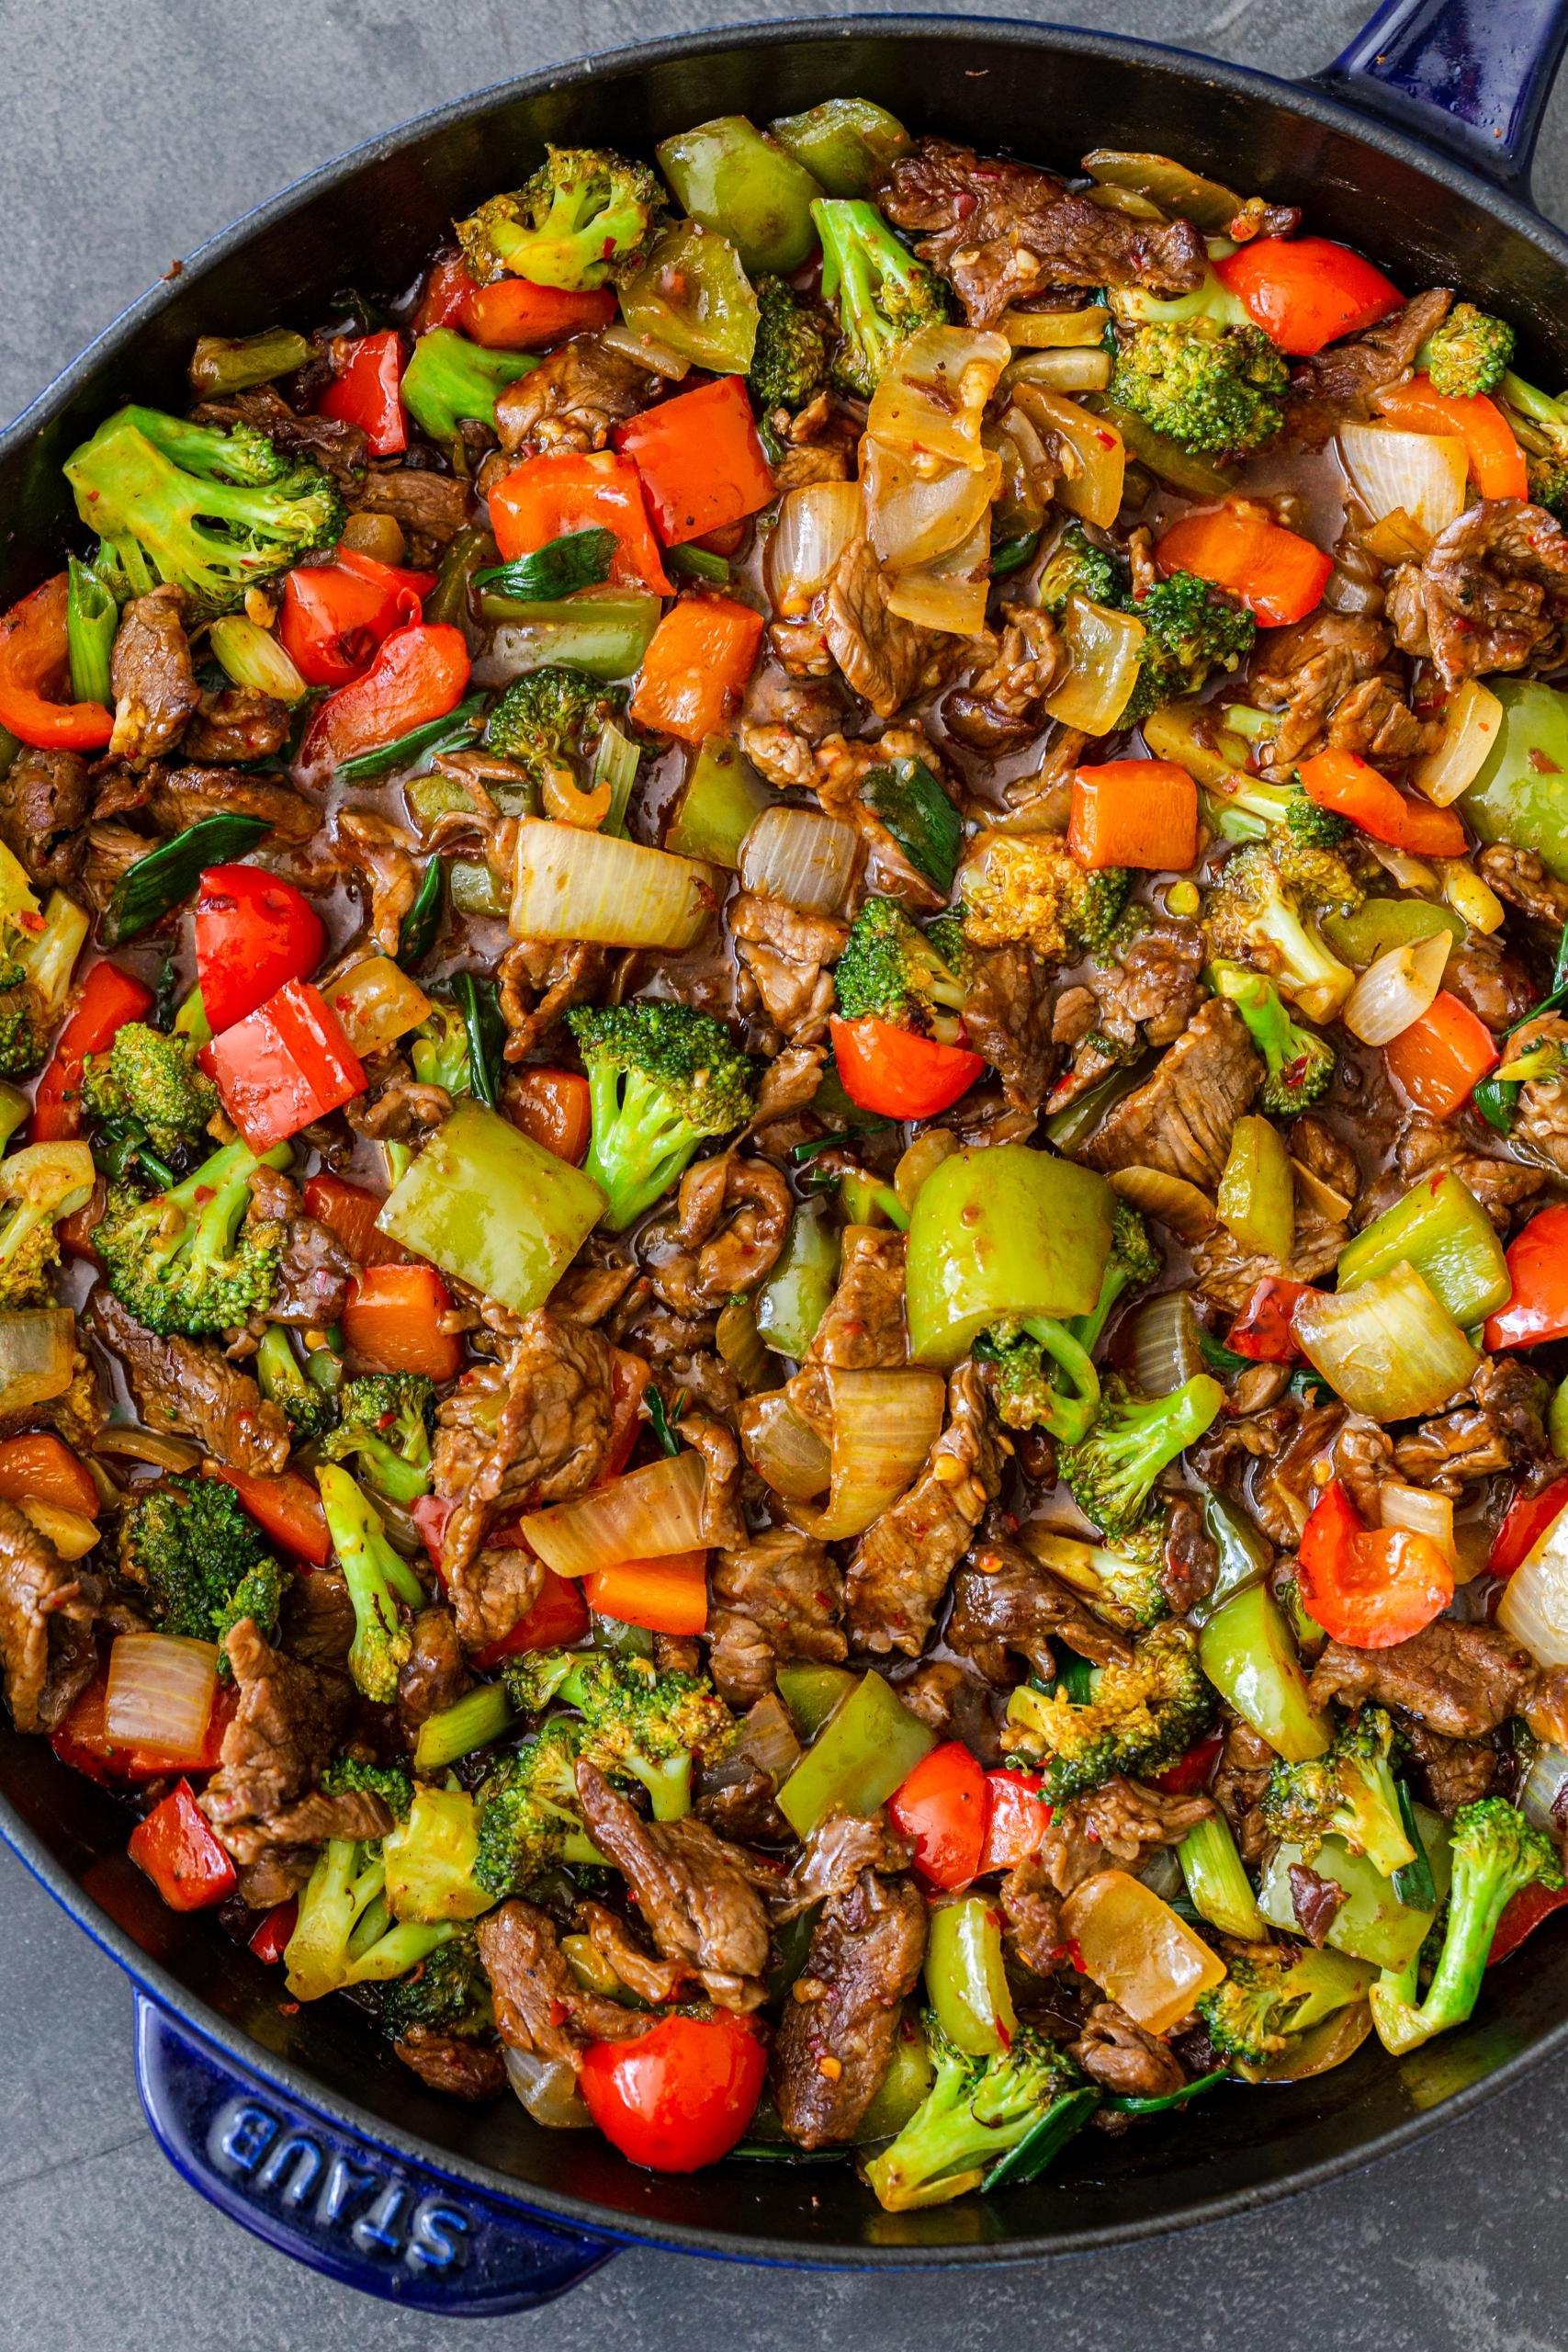 Hunan beef in a pan